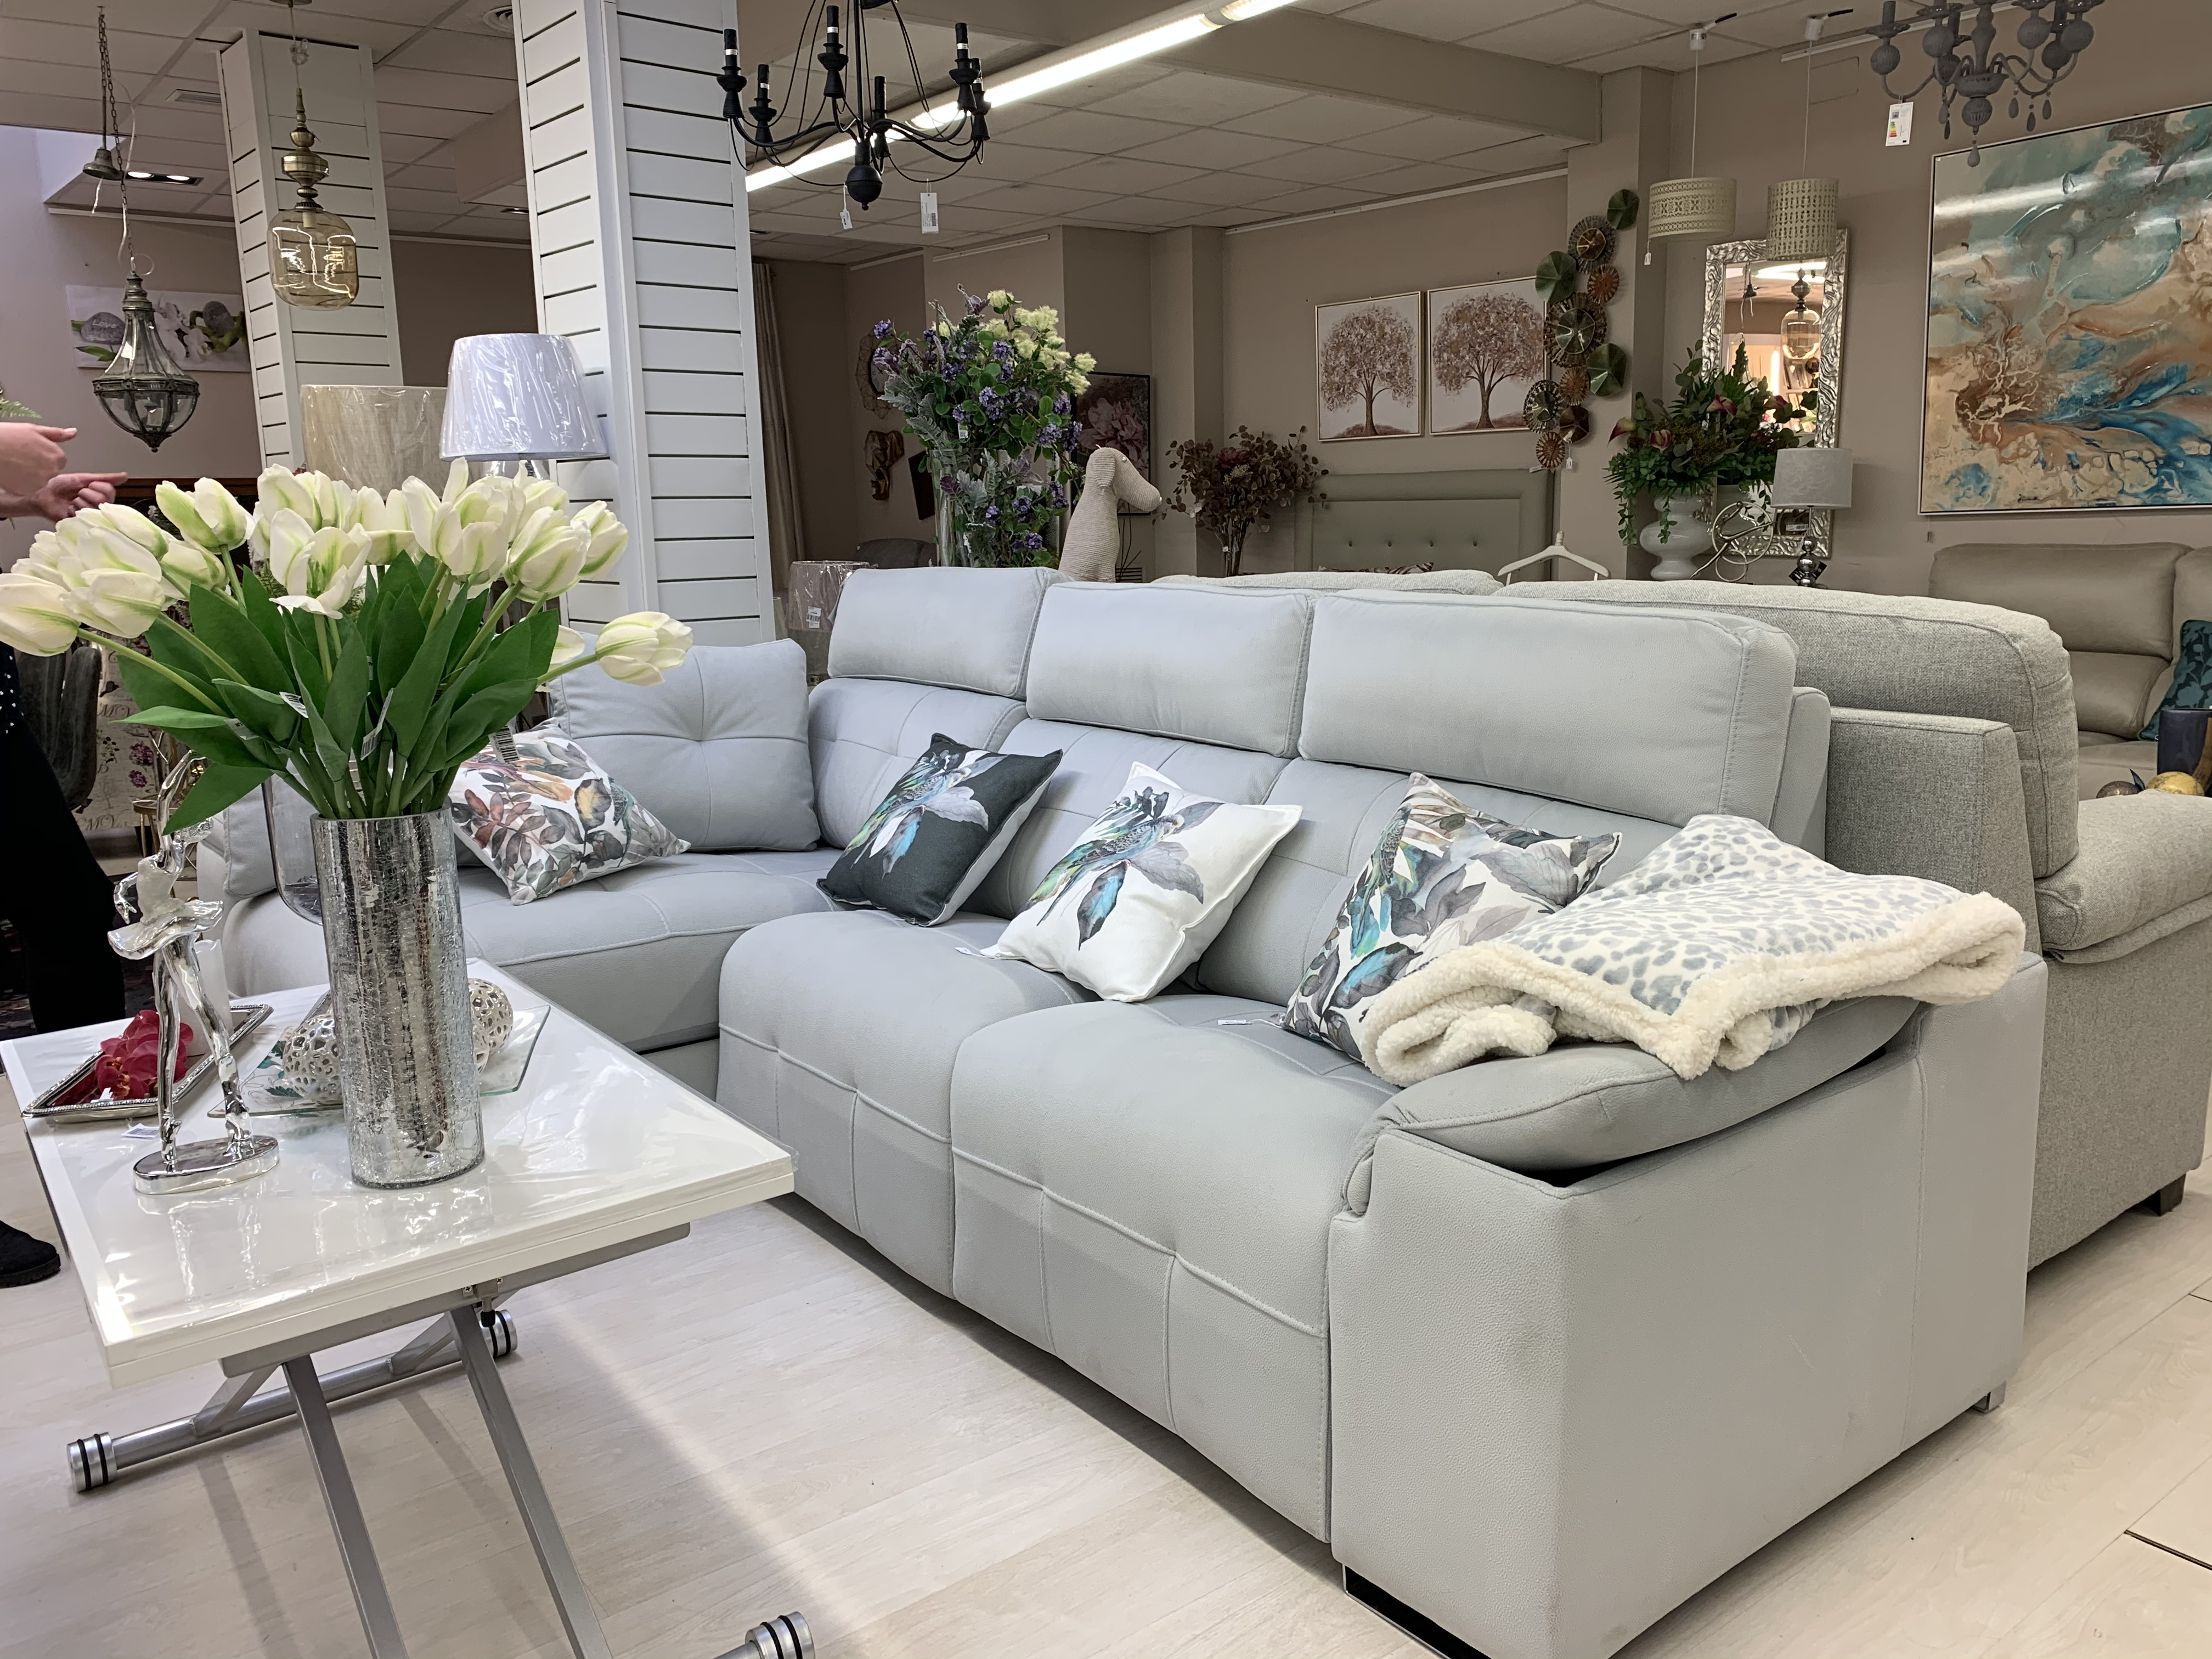 Artica tiendas sofa Dolce